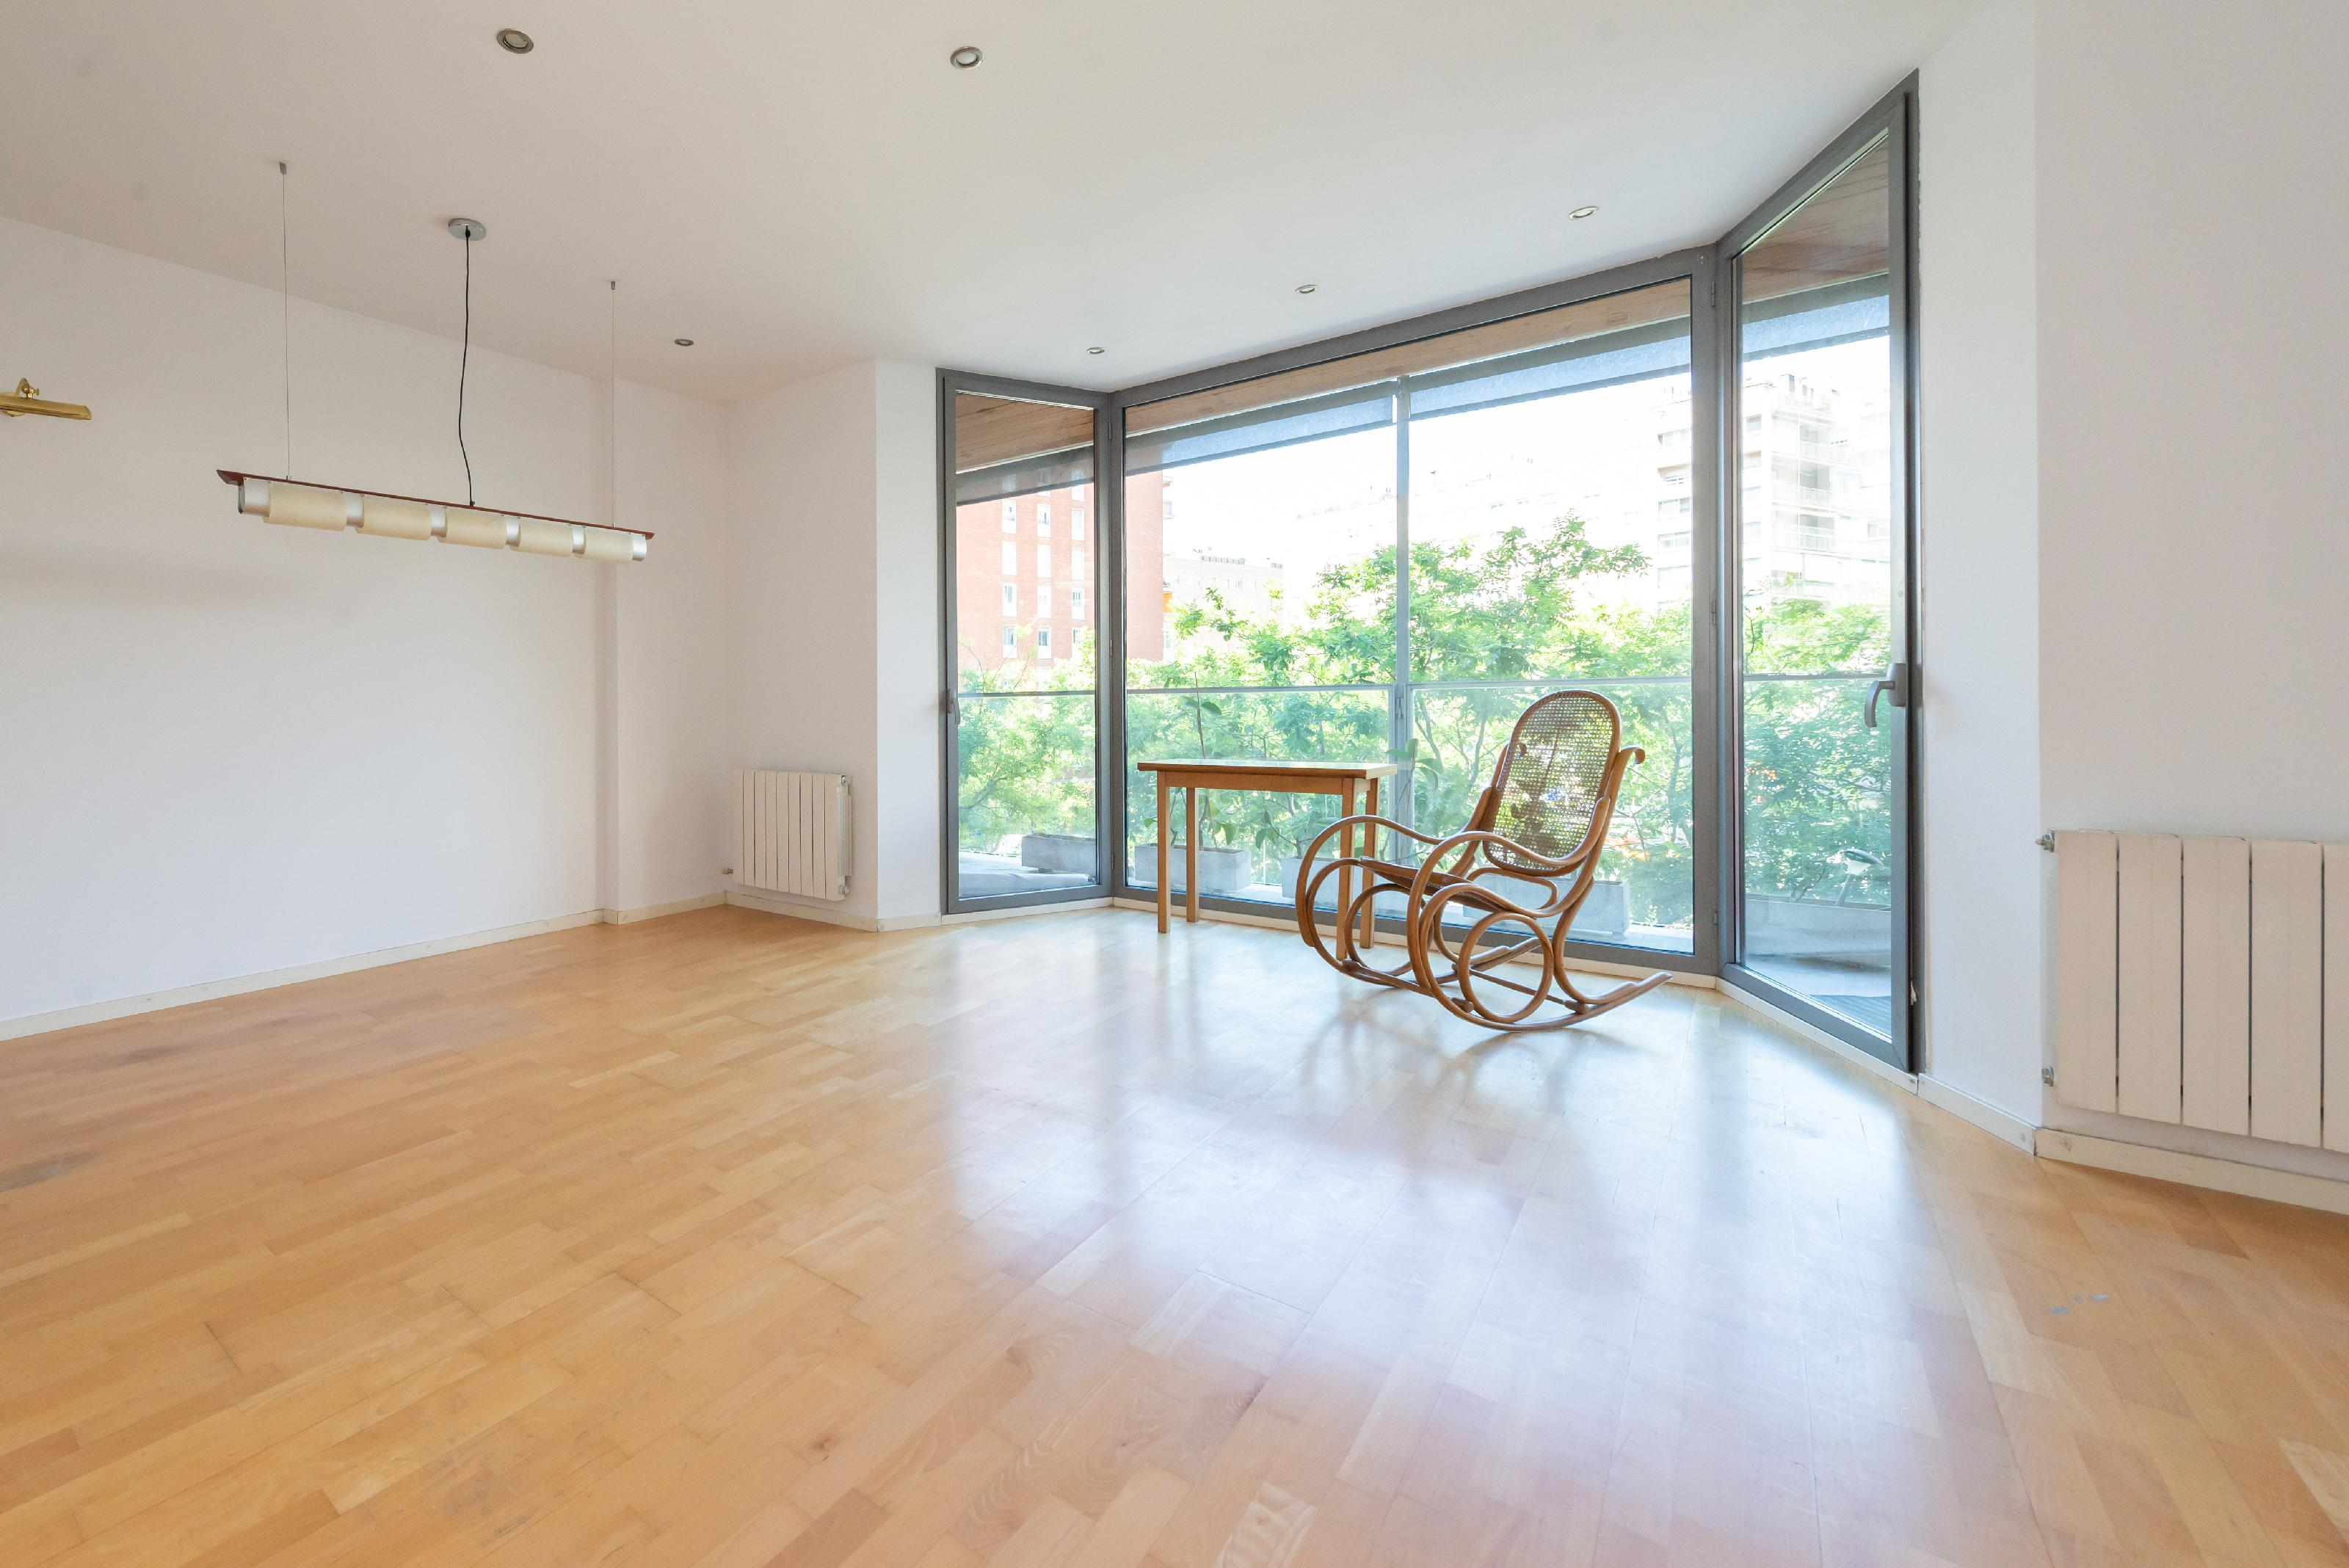 251446 Flat for sale in Sarrià-Sant Gervasi, Tres Torres 11